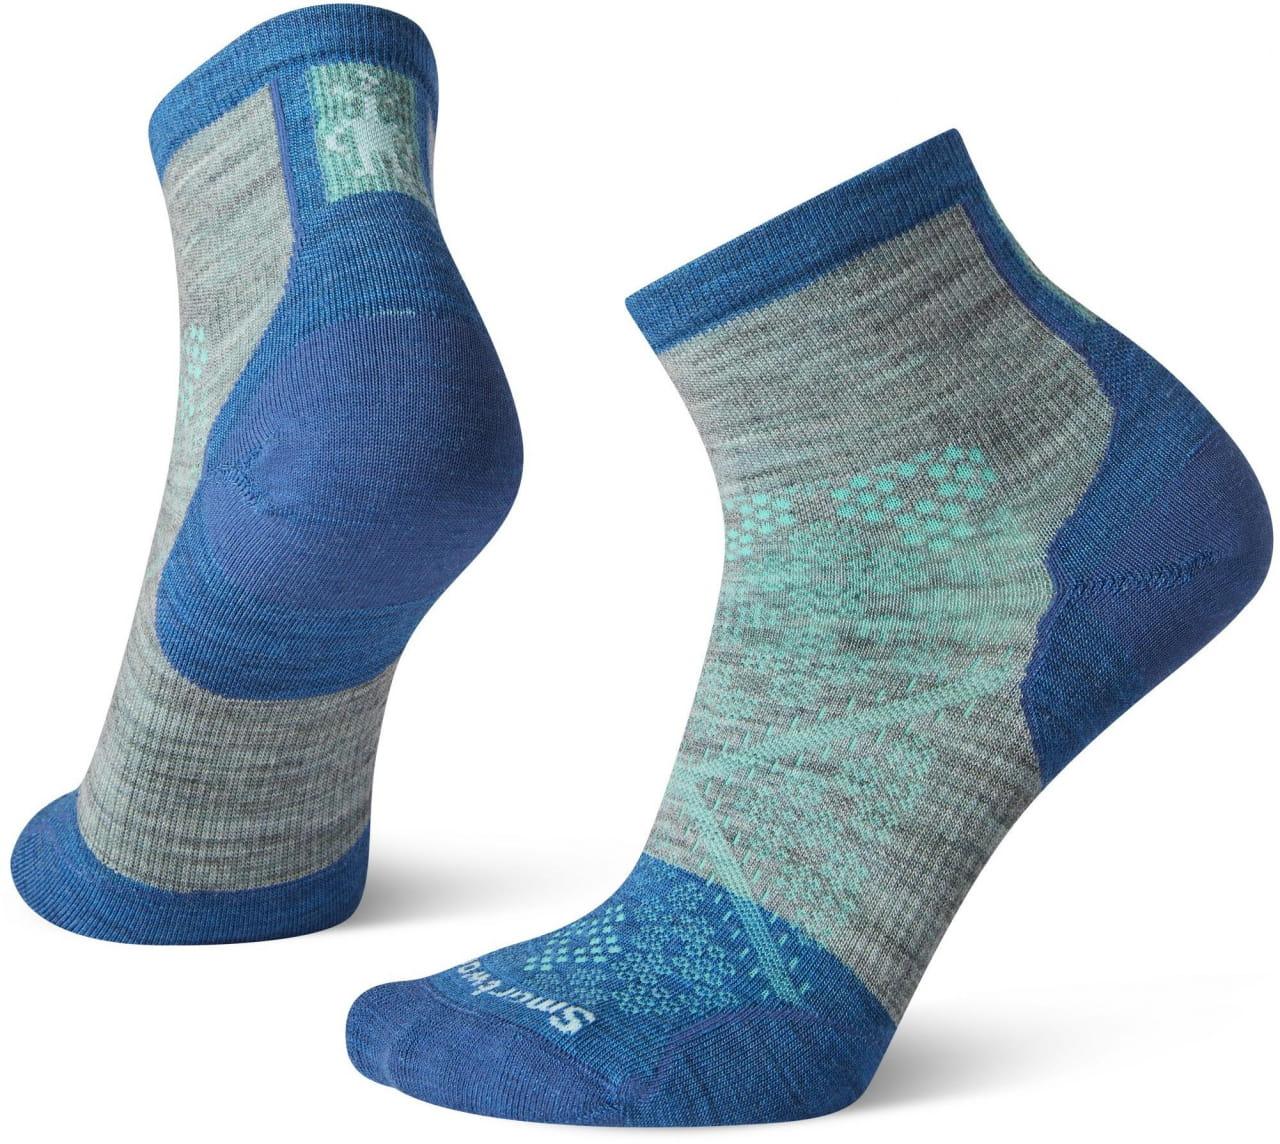 Dámské ponožky Smartwool W Perf Cycl Zer Cushi Ankight